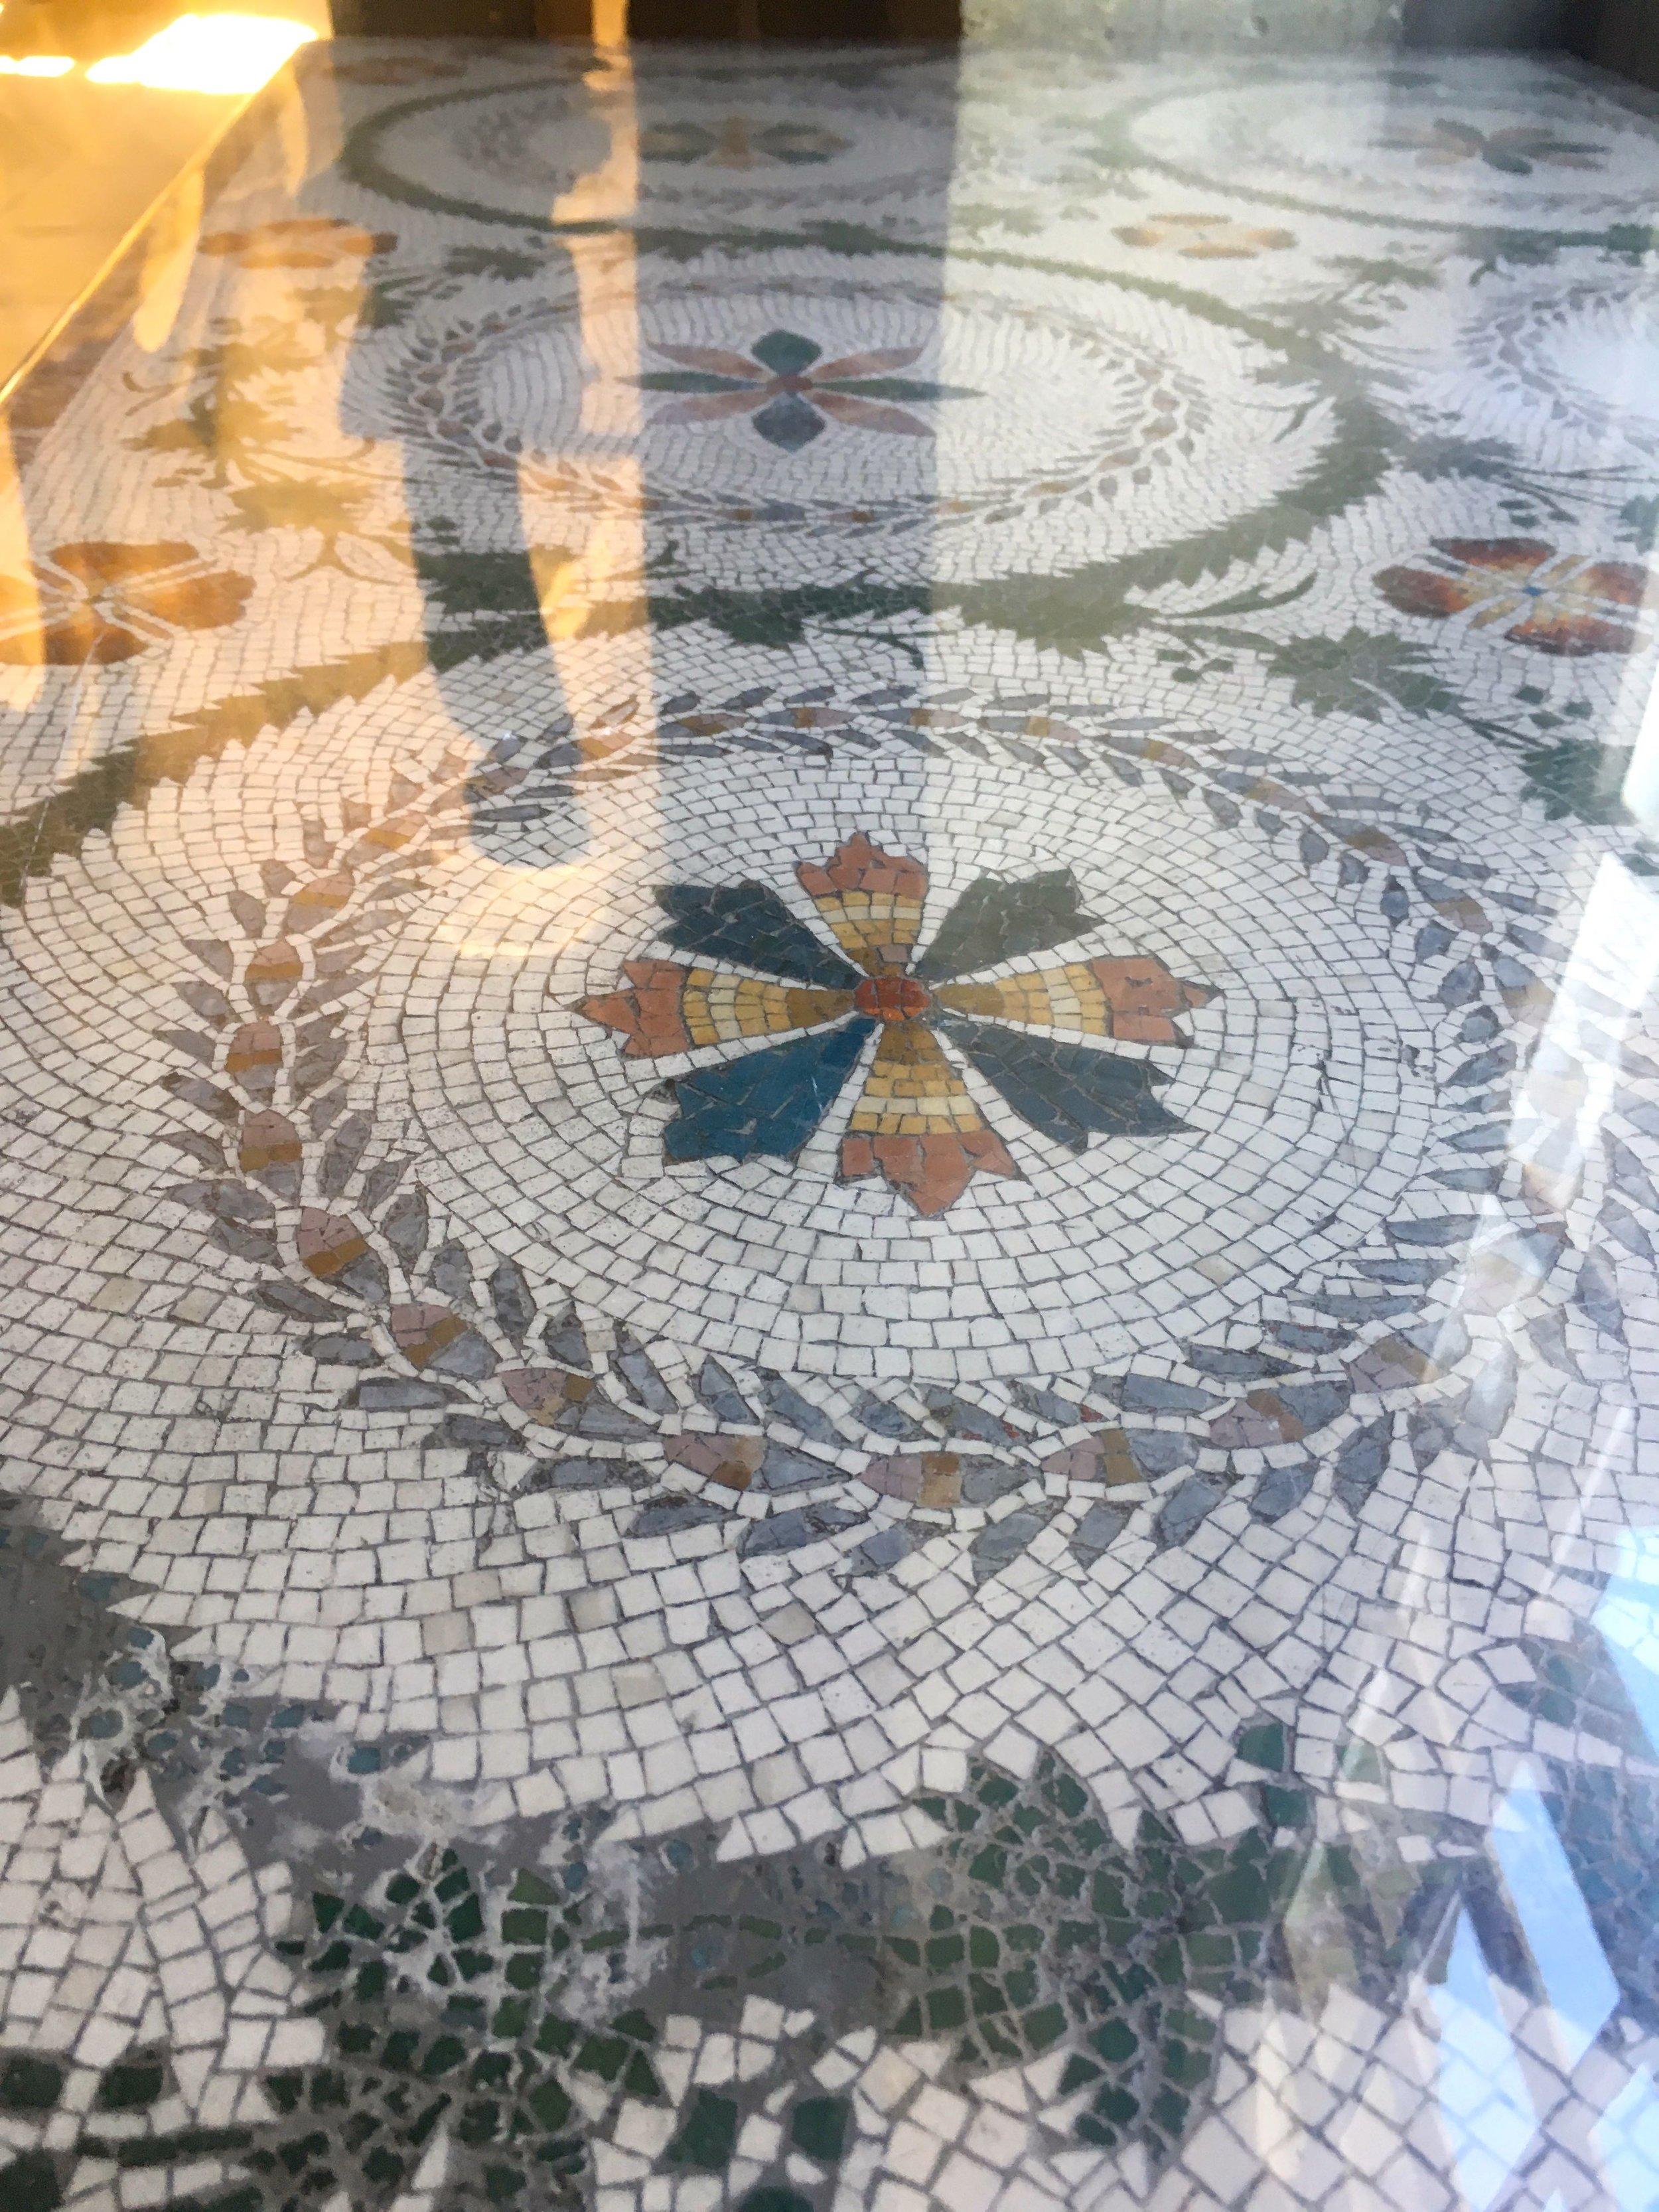 MOSAIC TABLE TOPS AT CASTLE HOWARD